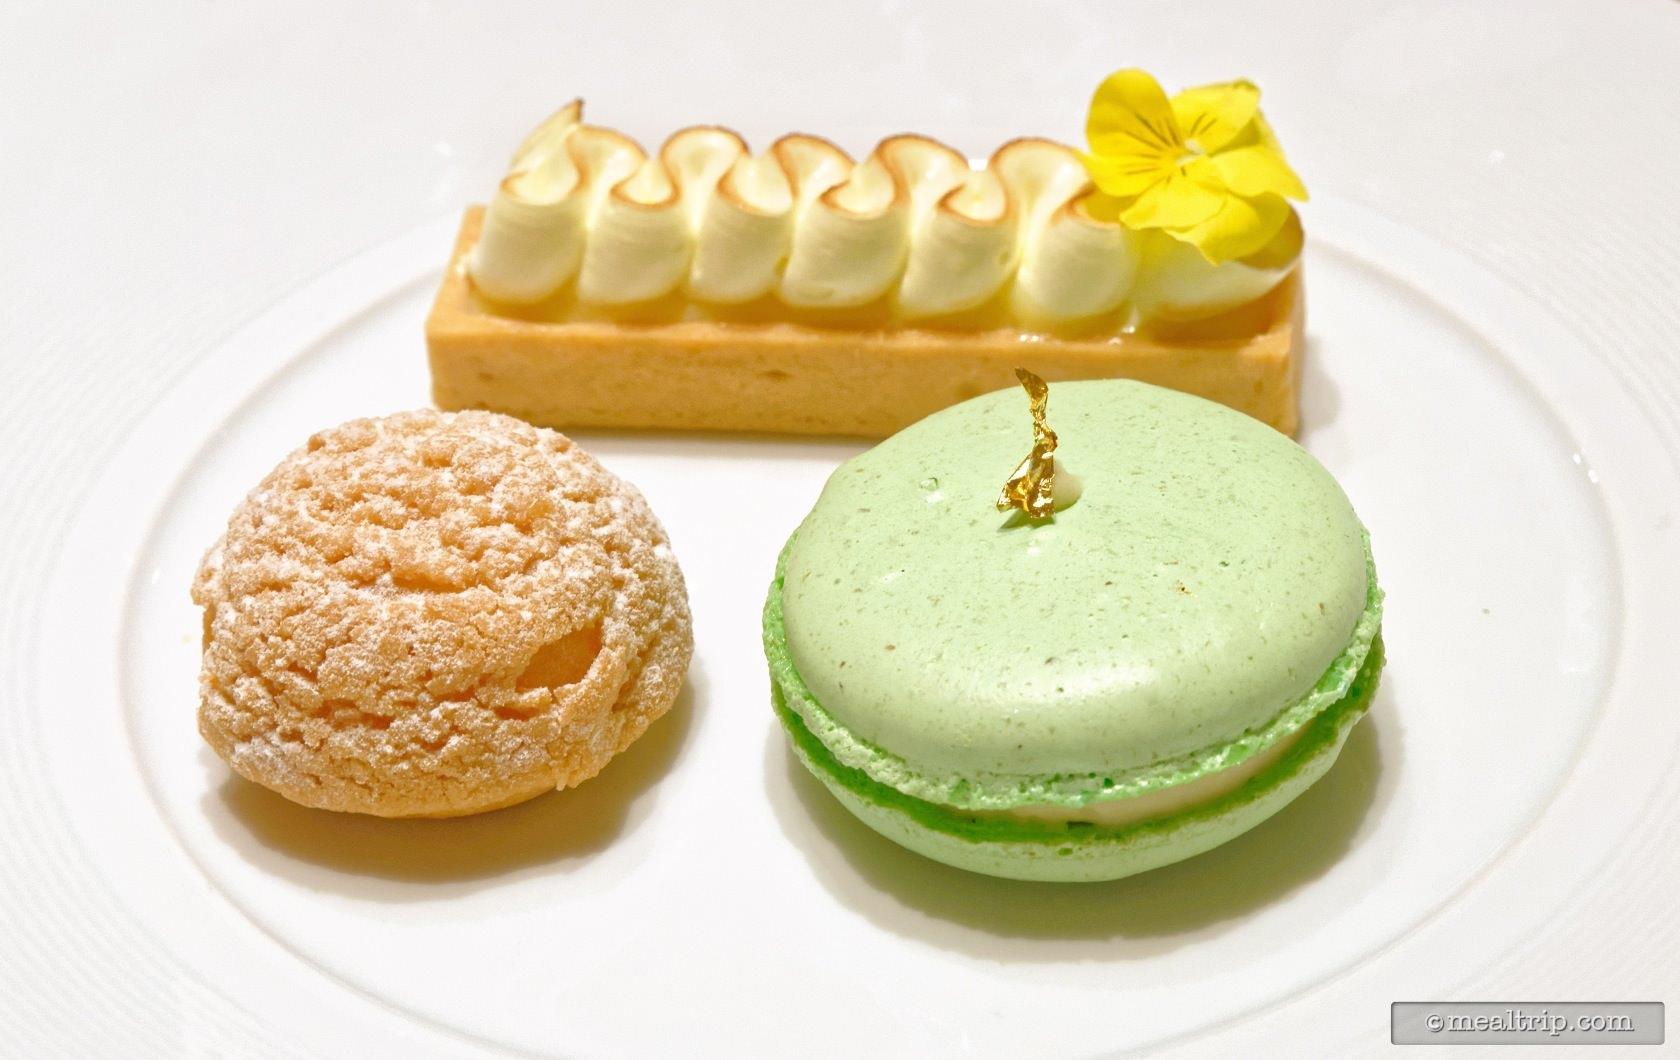 Plated Mini Desserts